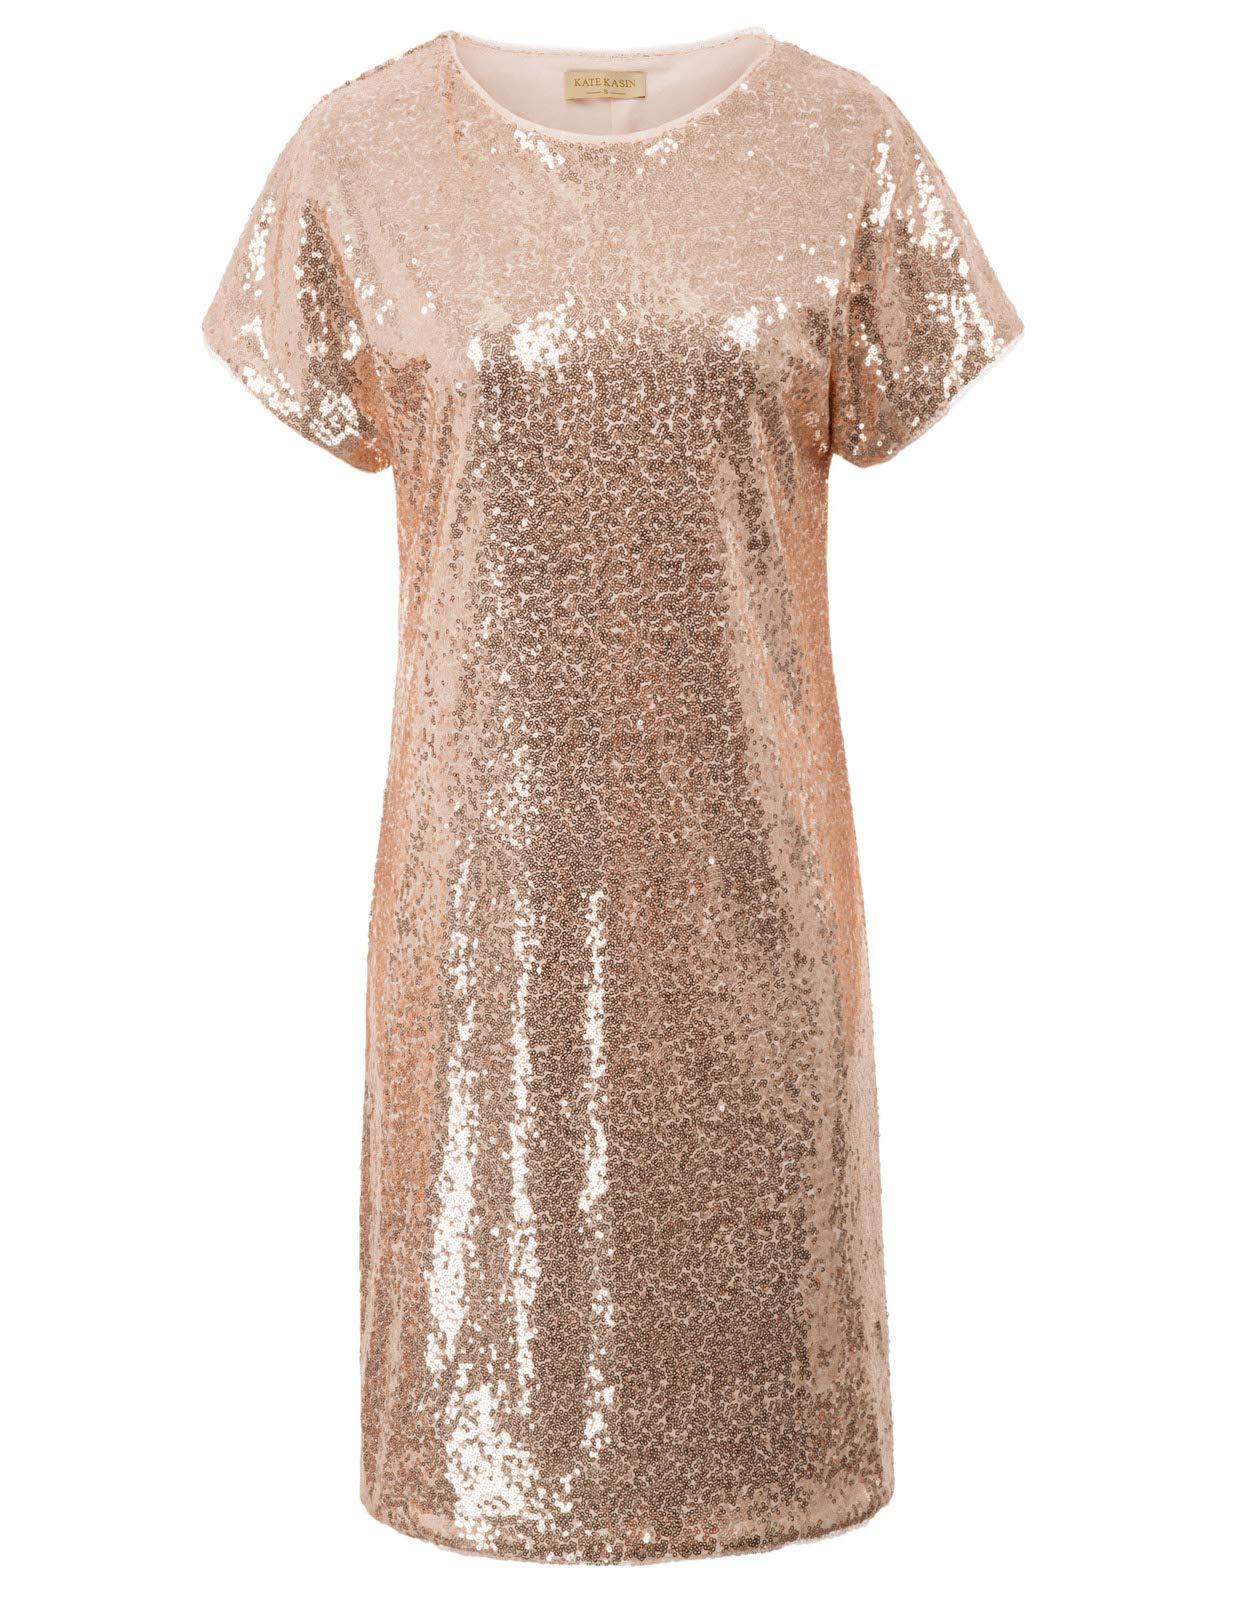 Kate Kasin Women Sparkle Sequin Loose Party Dress Short Sleeve Cocktail Dresses